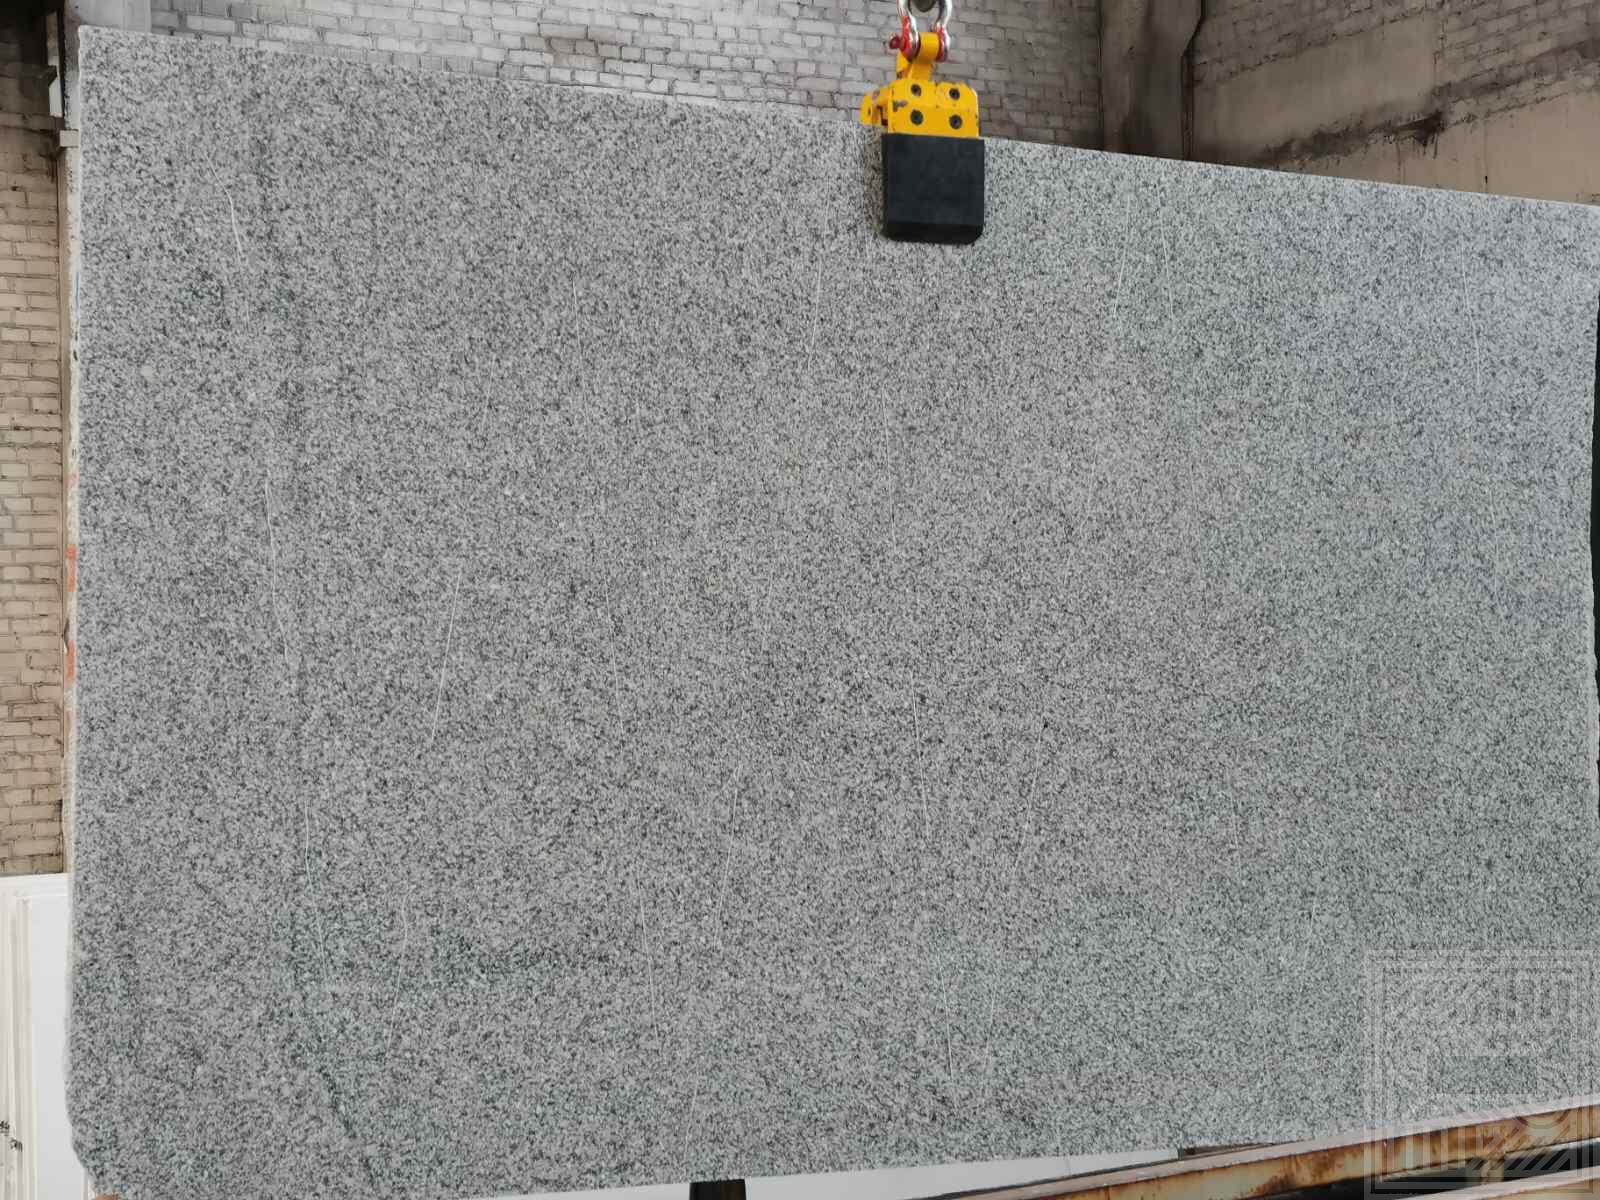 Bianco Sardo (30 mm) granite - Bianco Sarda maj 30 mm 2020